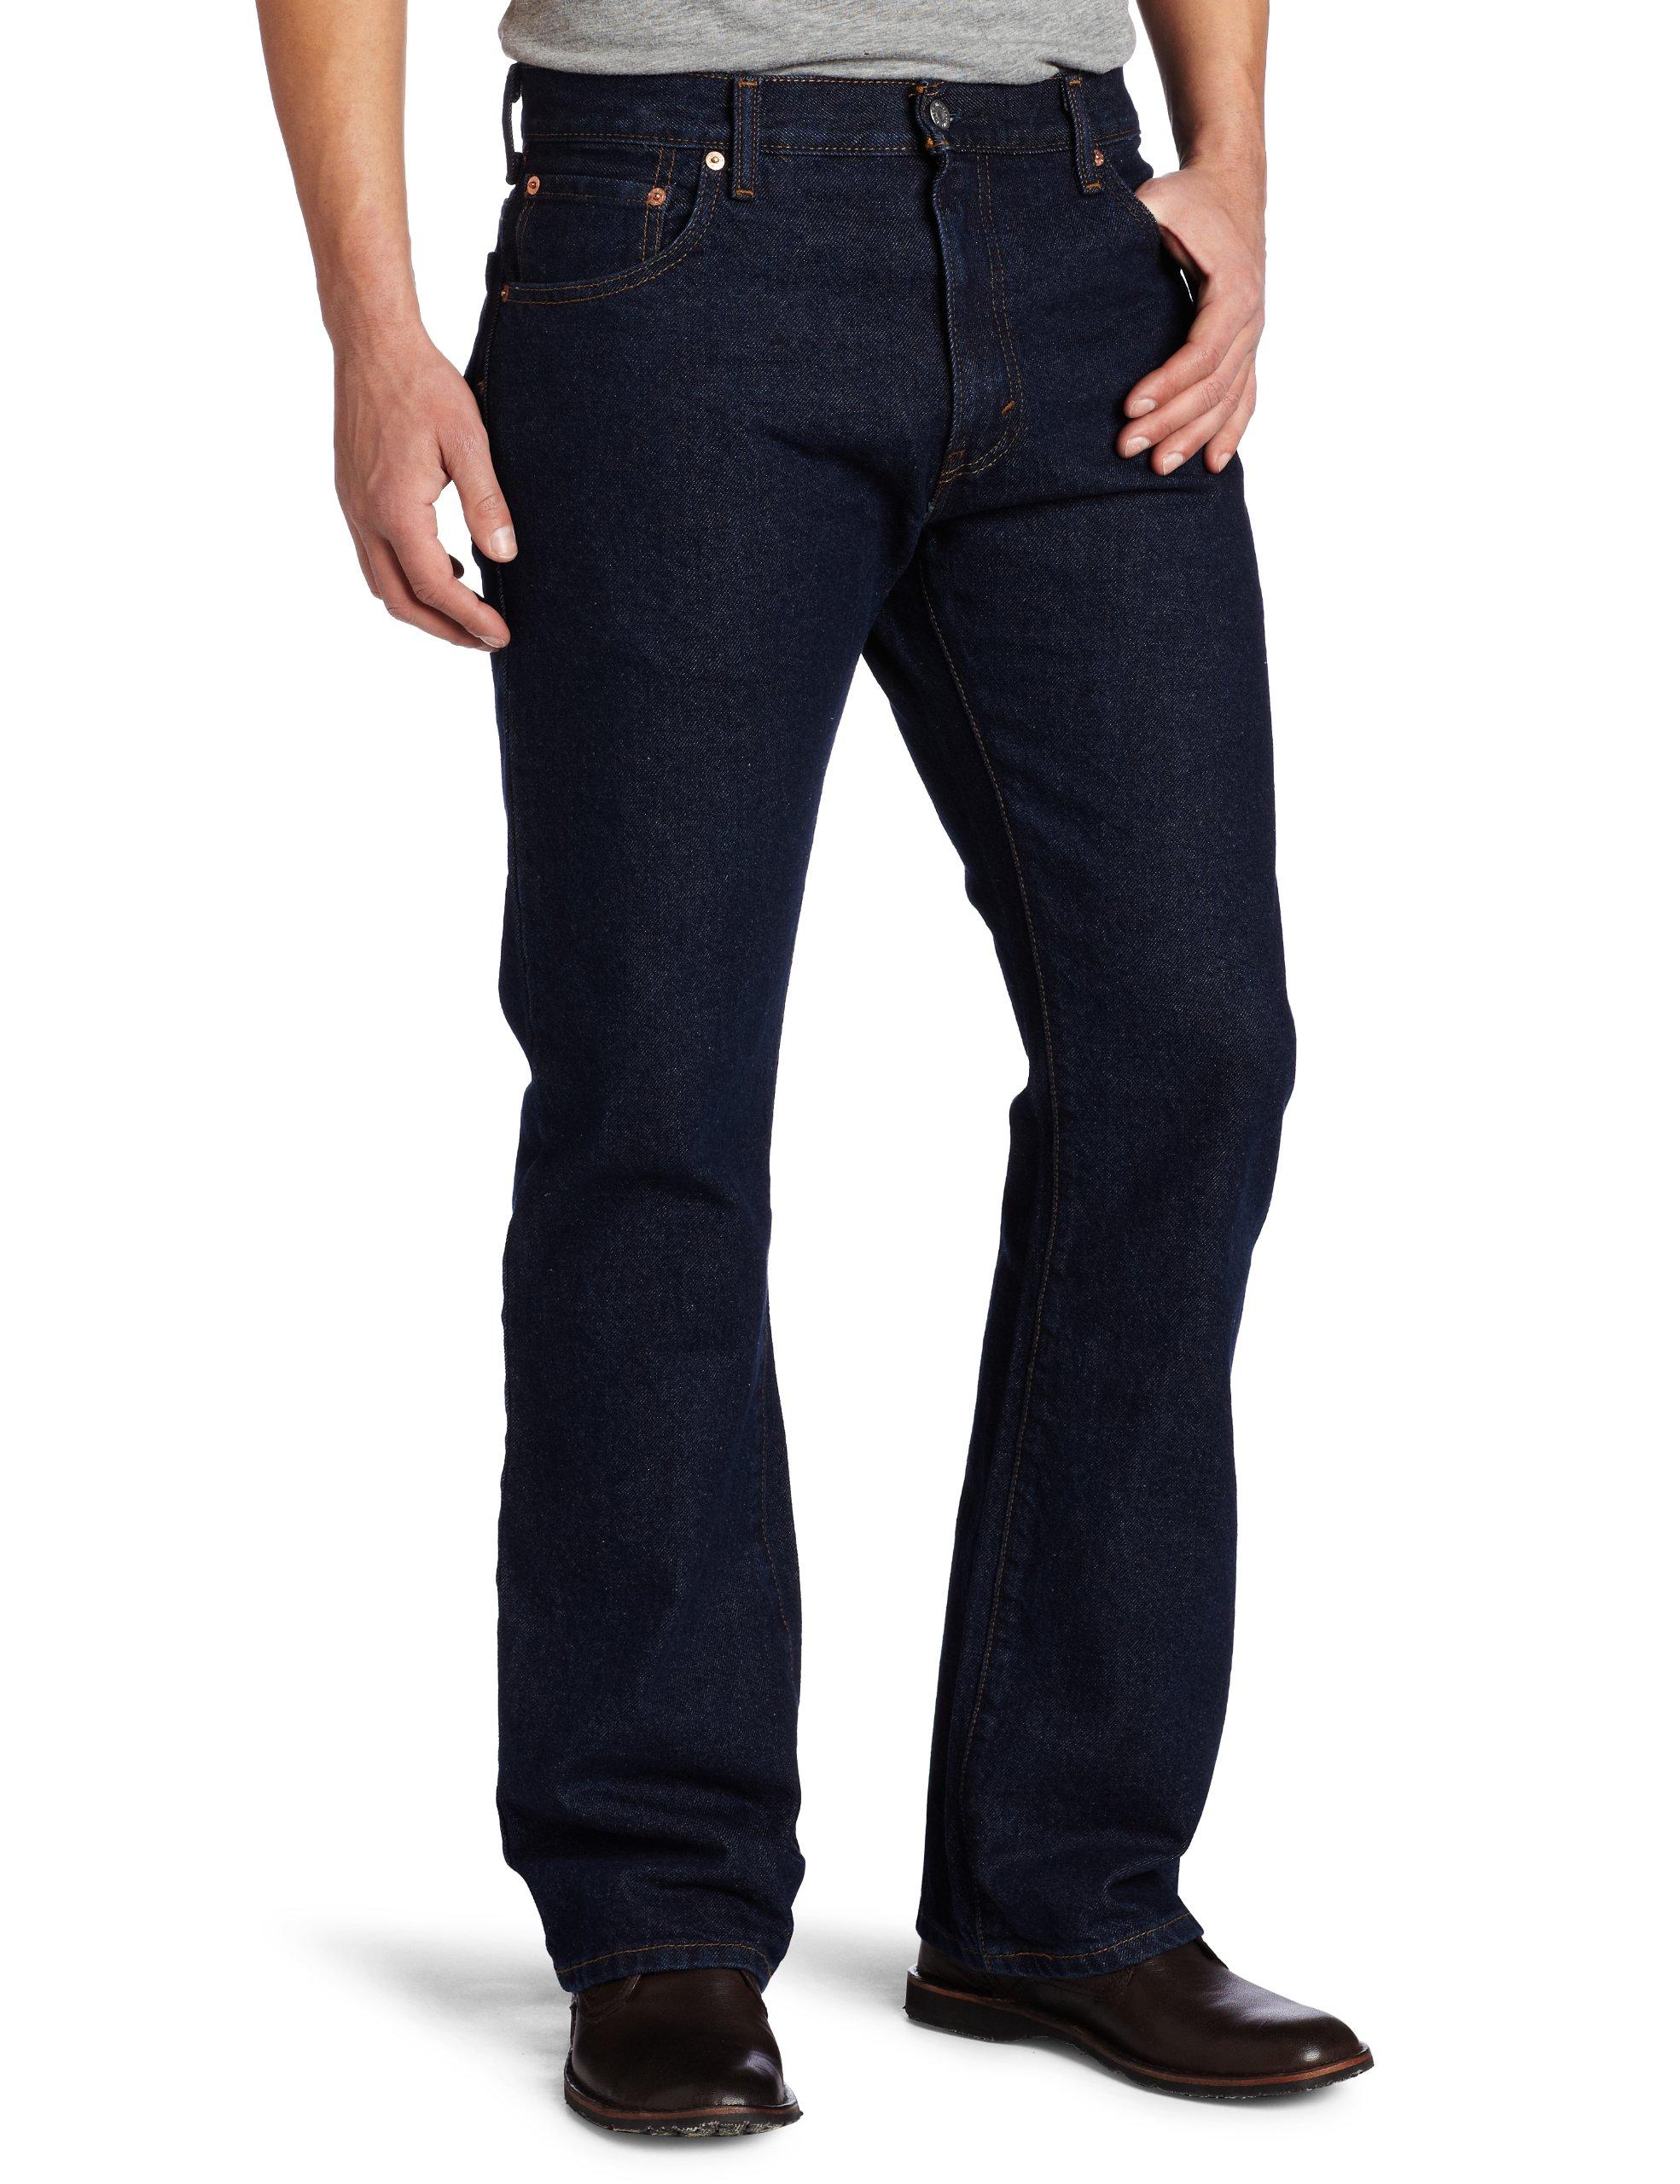 Levi's Men's 517 Boot Cut Jean, Rinse, 34x34